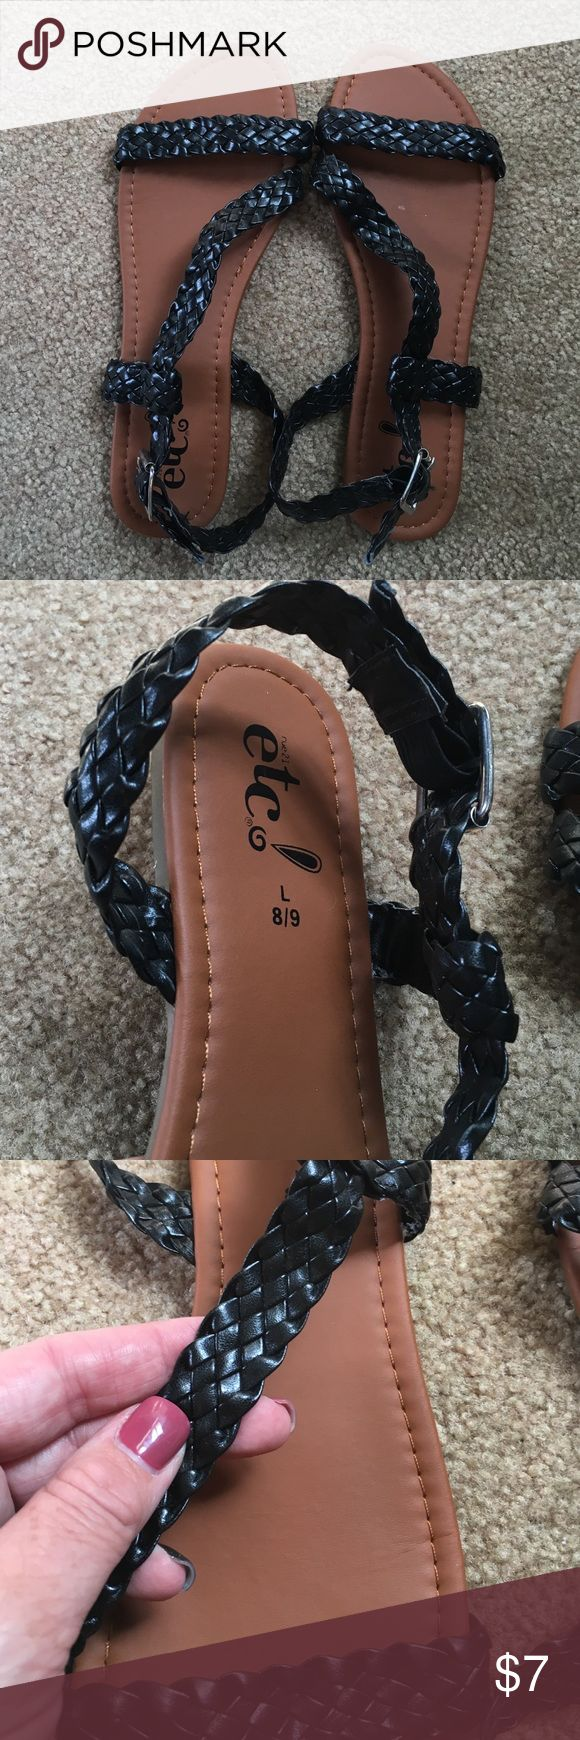 Black braided sandals Worn once, black braided sandals Shoes Sandals